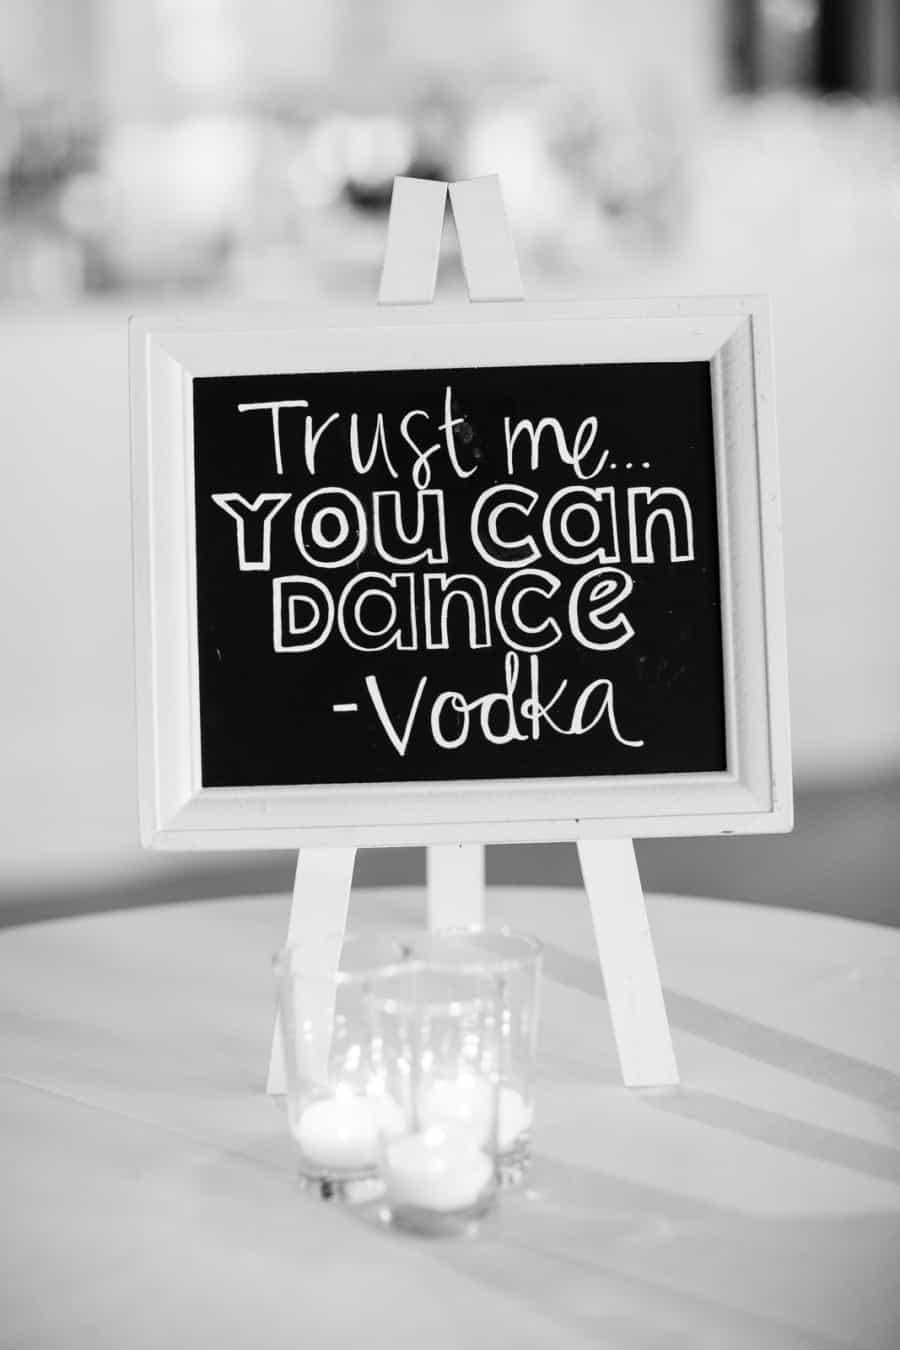 trust me... you can dance - vodka